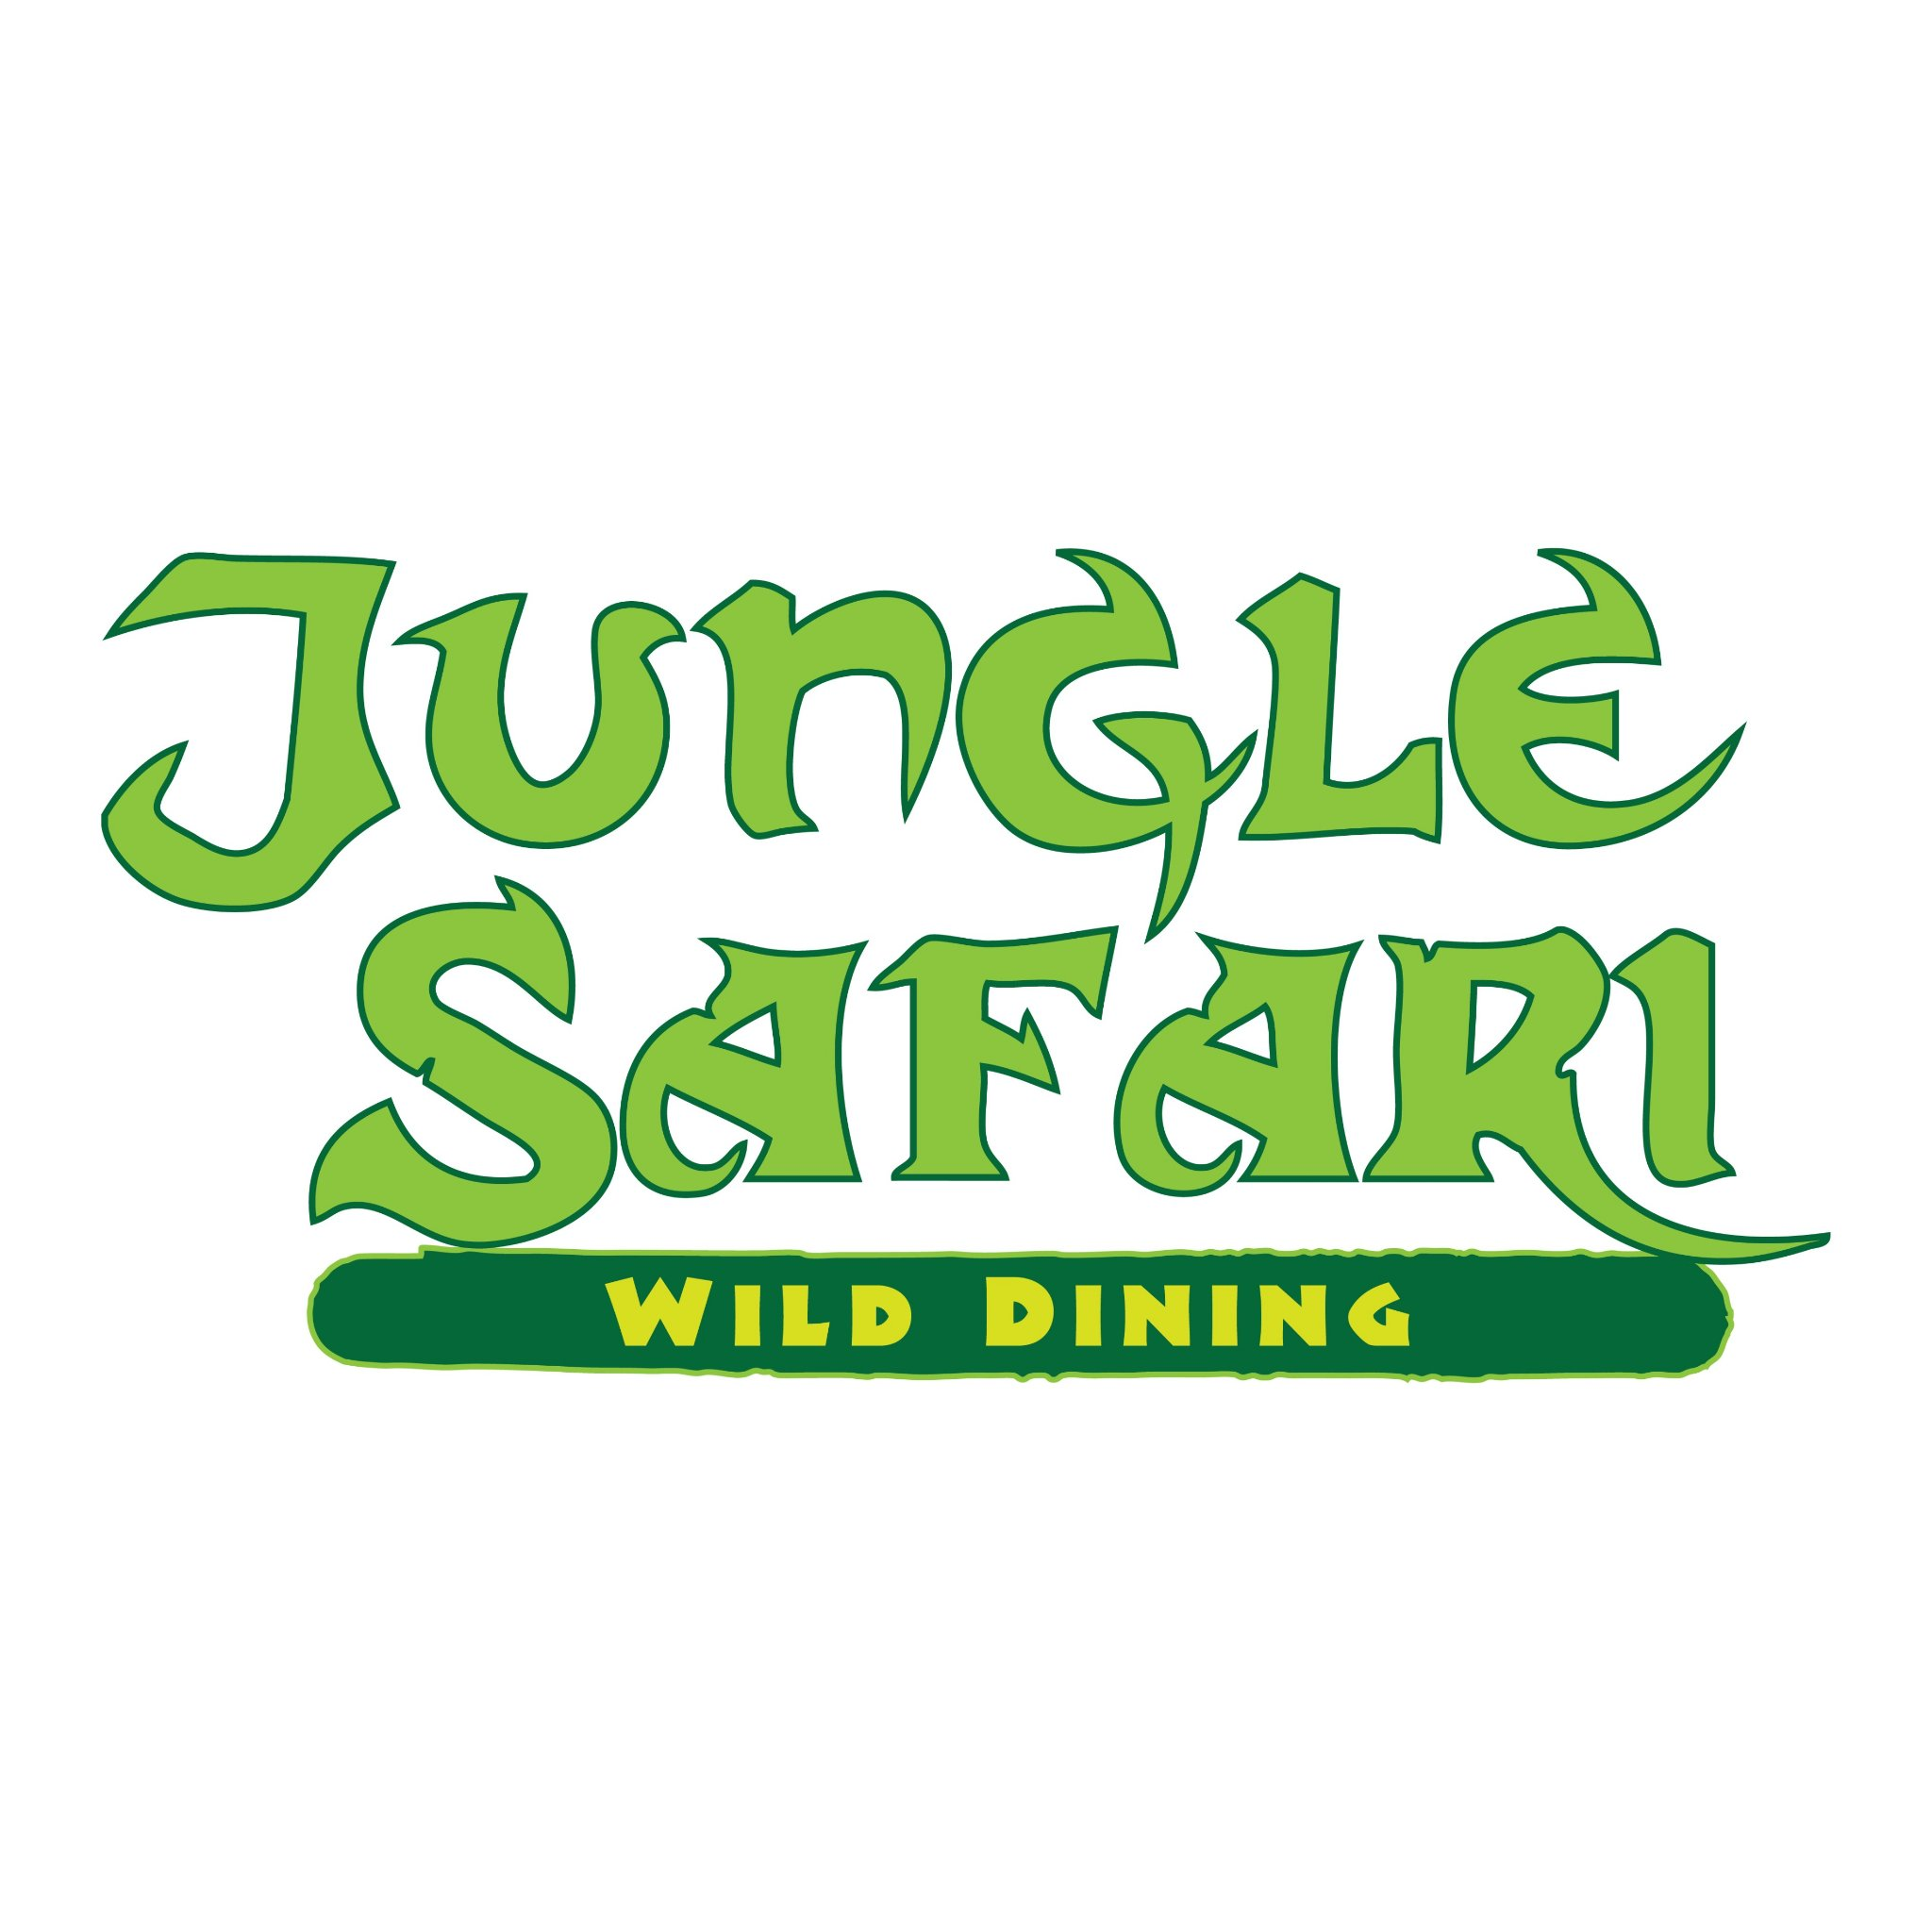 Jungle Safari on Twitter: